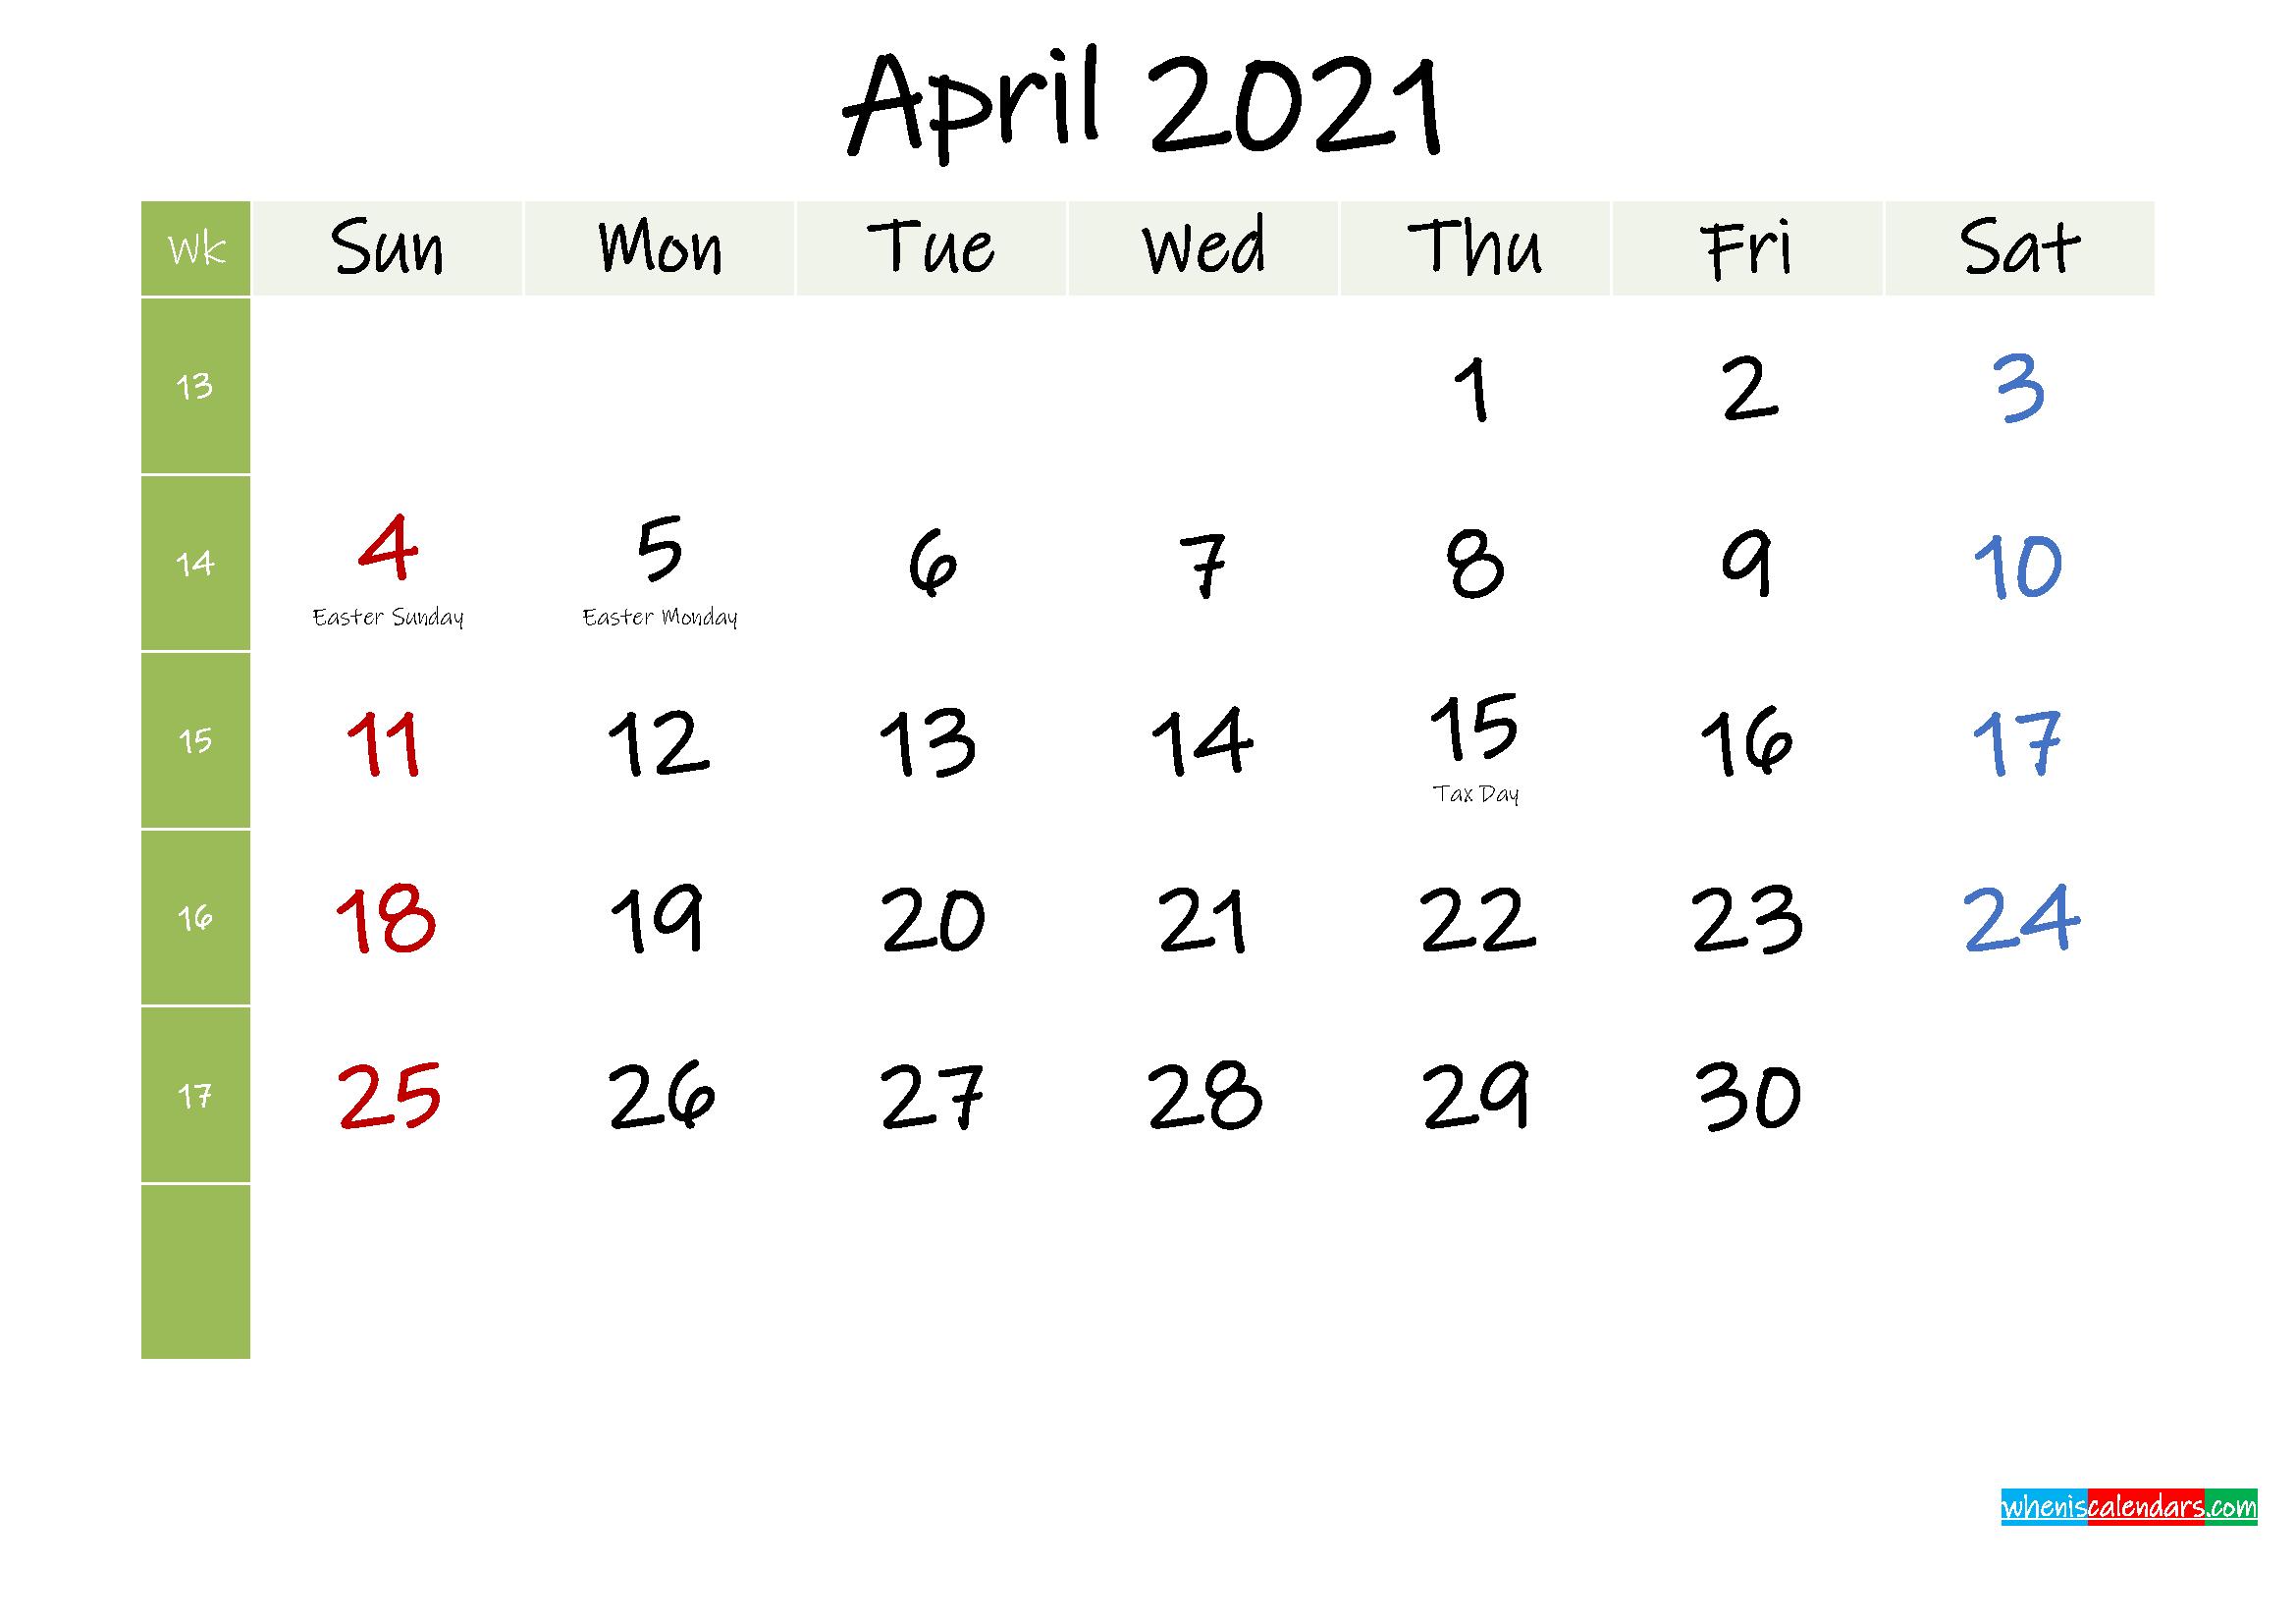 Free April 2021 Printable Calendar with Holidays